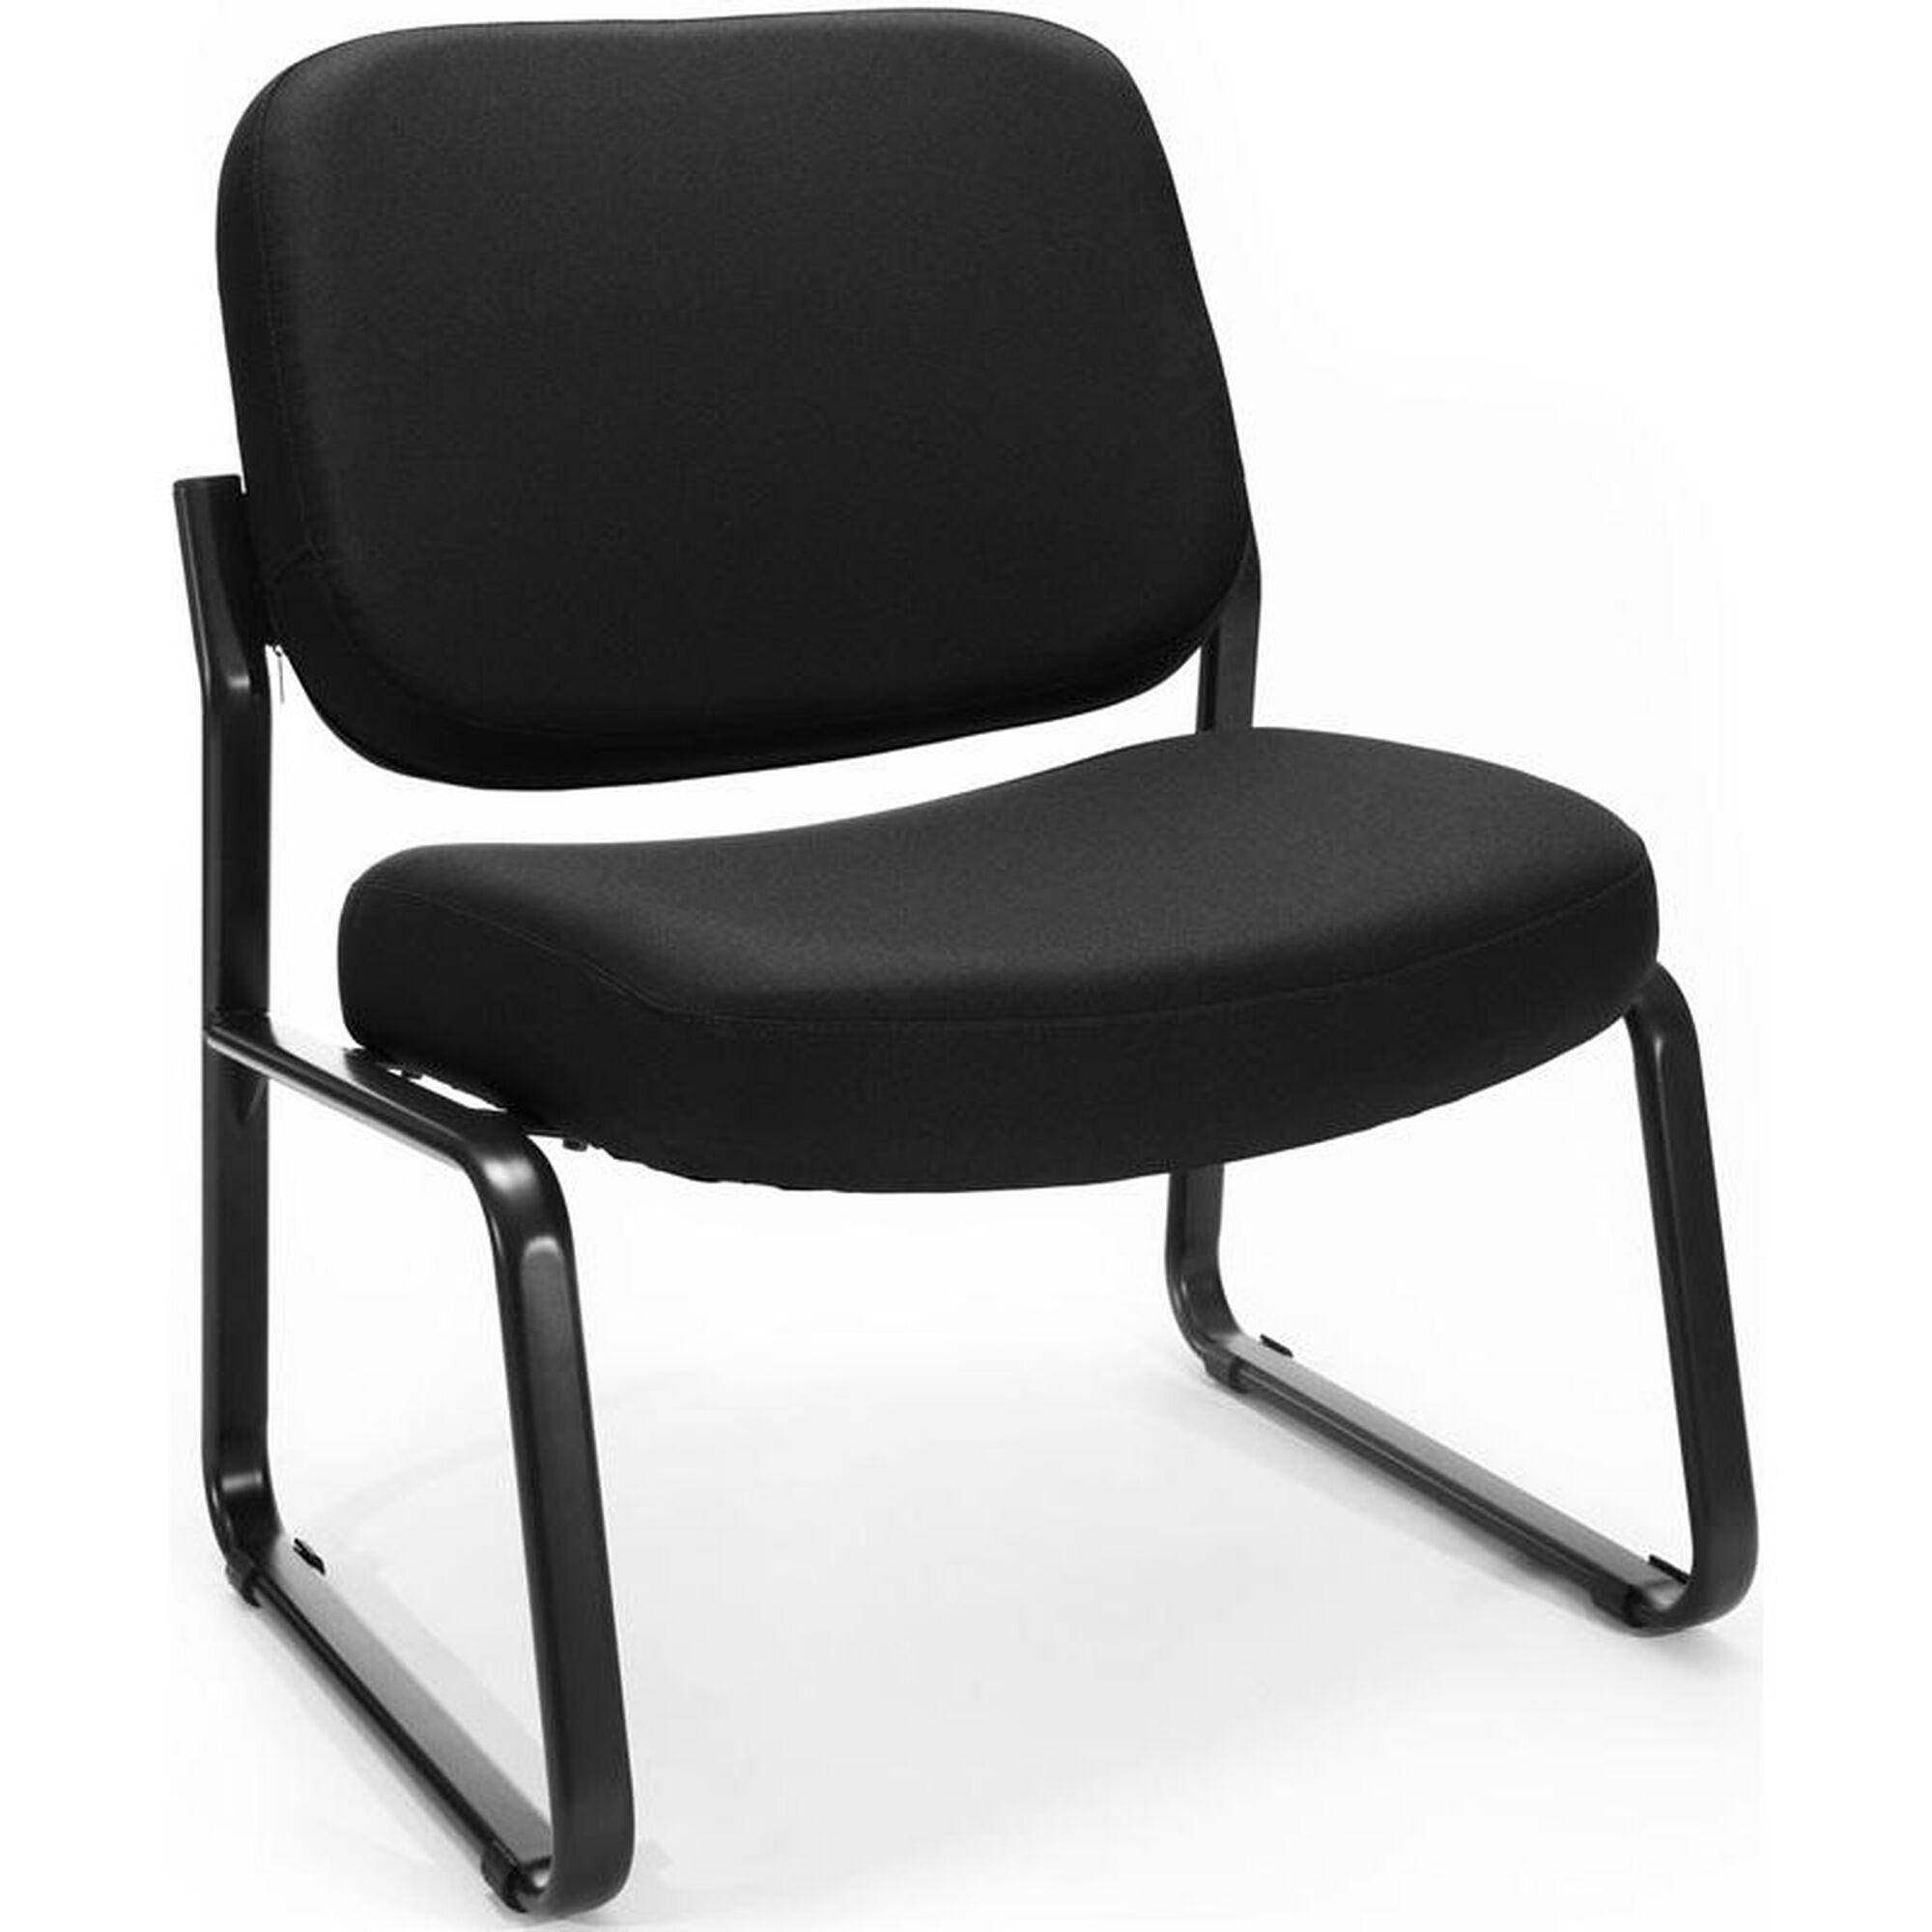 Super Big Tall Guest And Reception Fabric Chair Black Creativecarmelina Interior Chair Design Creativecarmelinacom